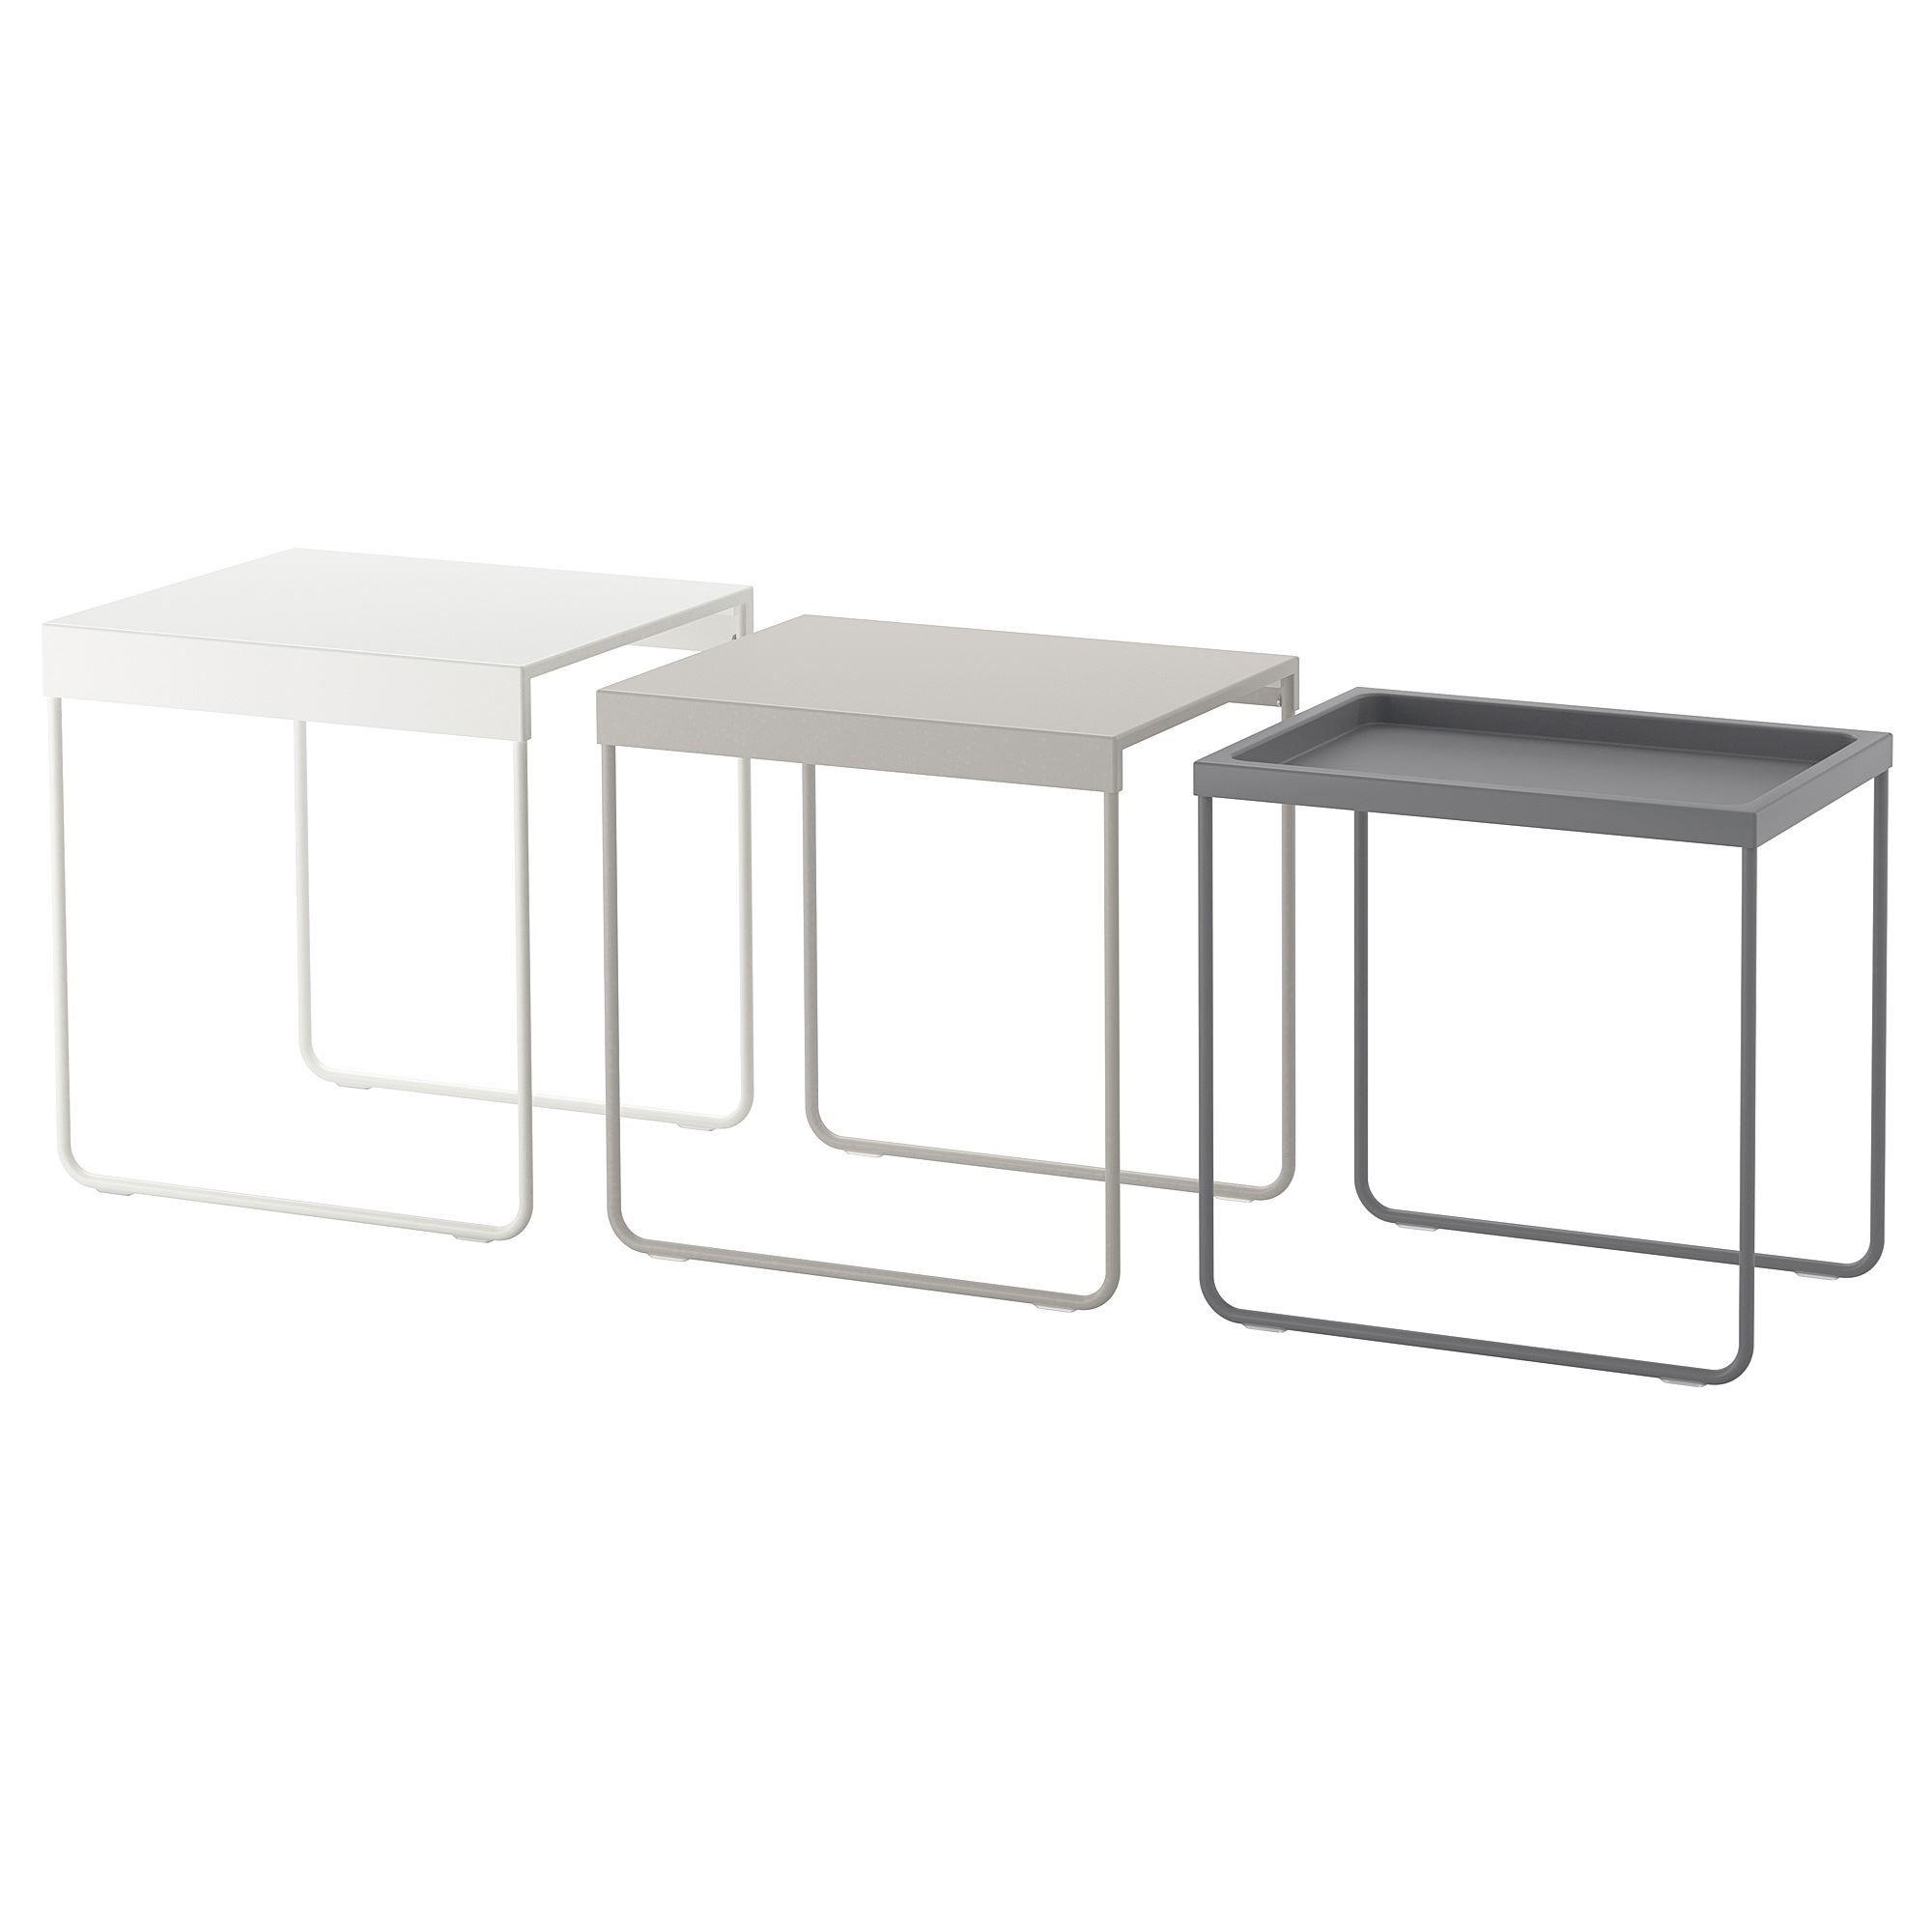 GRANBODA nest of tables | IKEA Living Room | want! | Pinterest ...